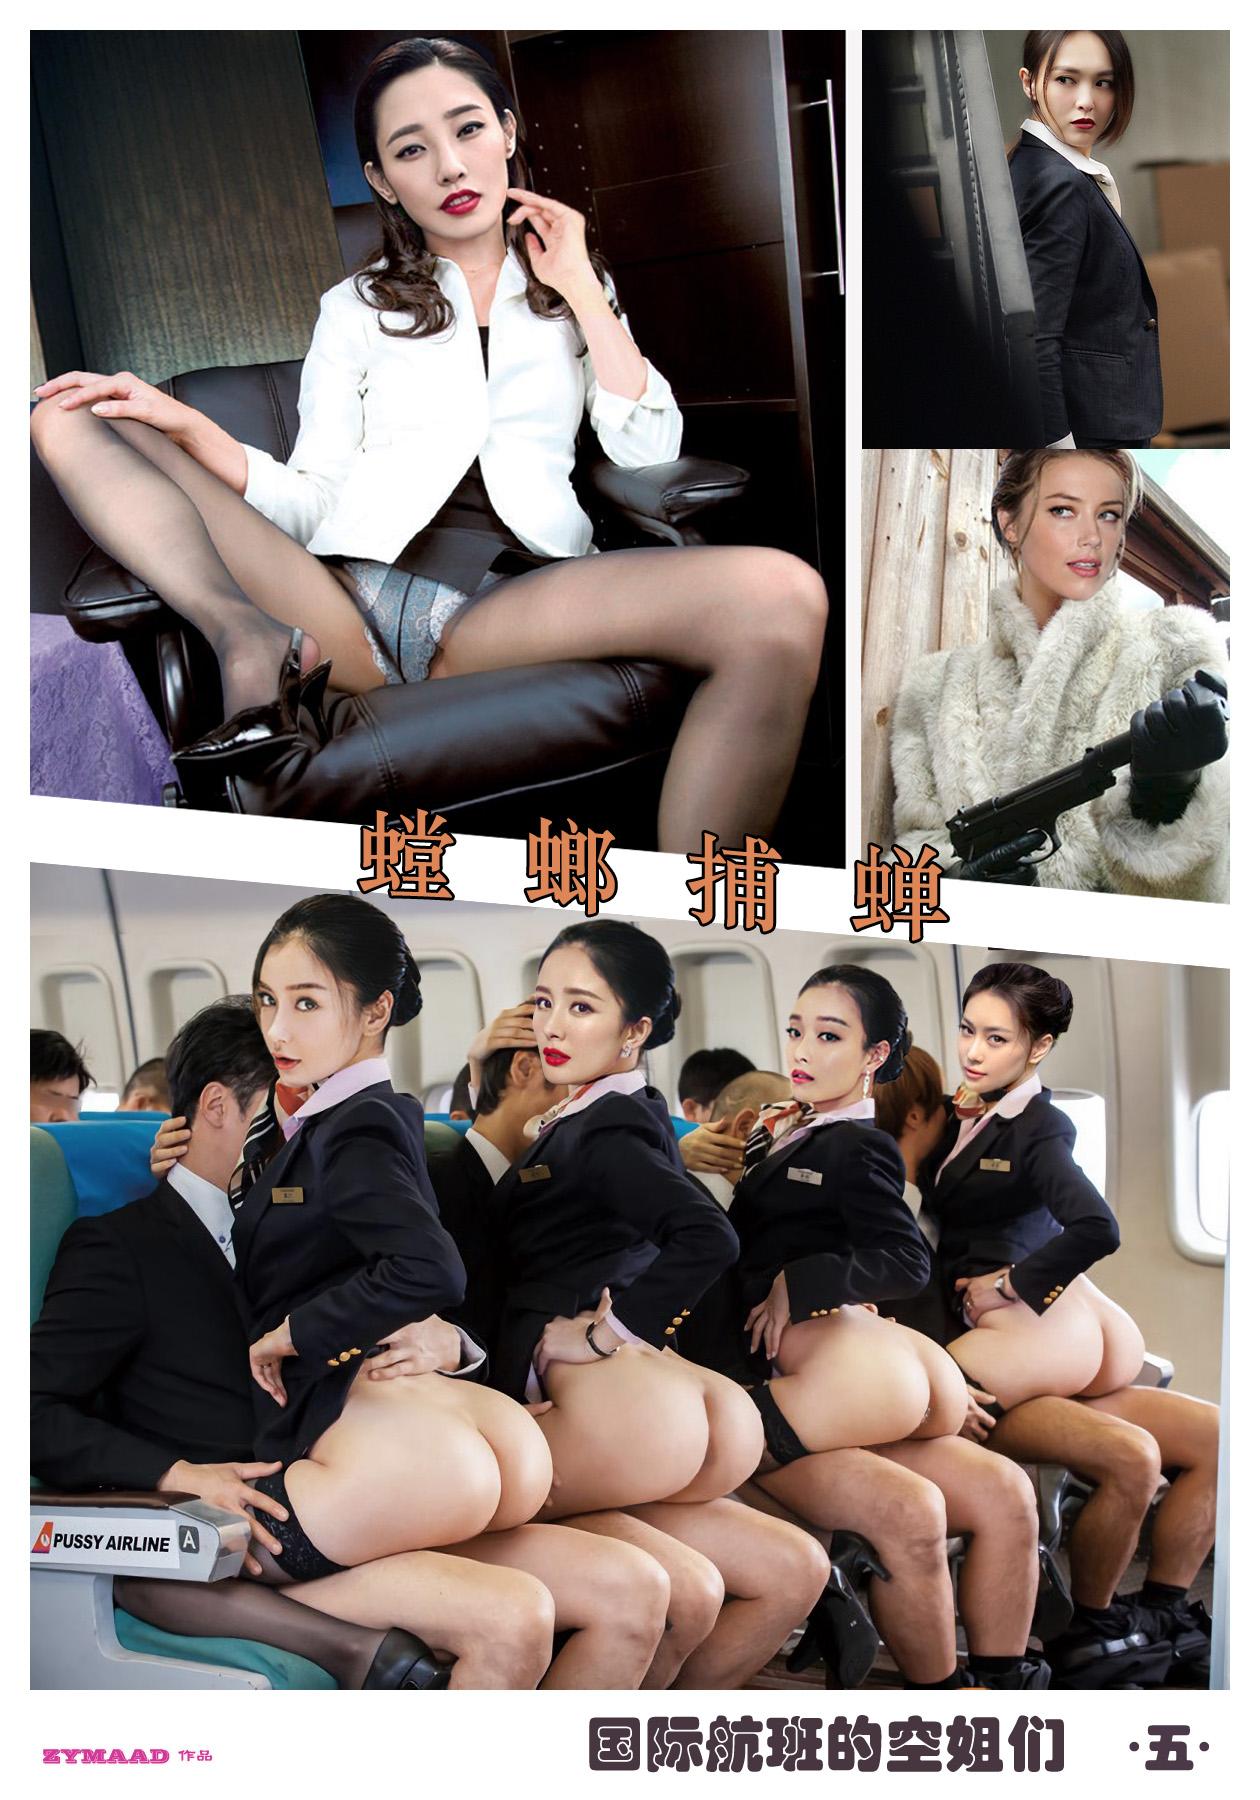 Sexinsex 国际航班的空姐zymaad SexInSex! Board